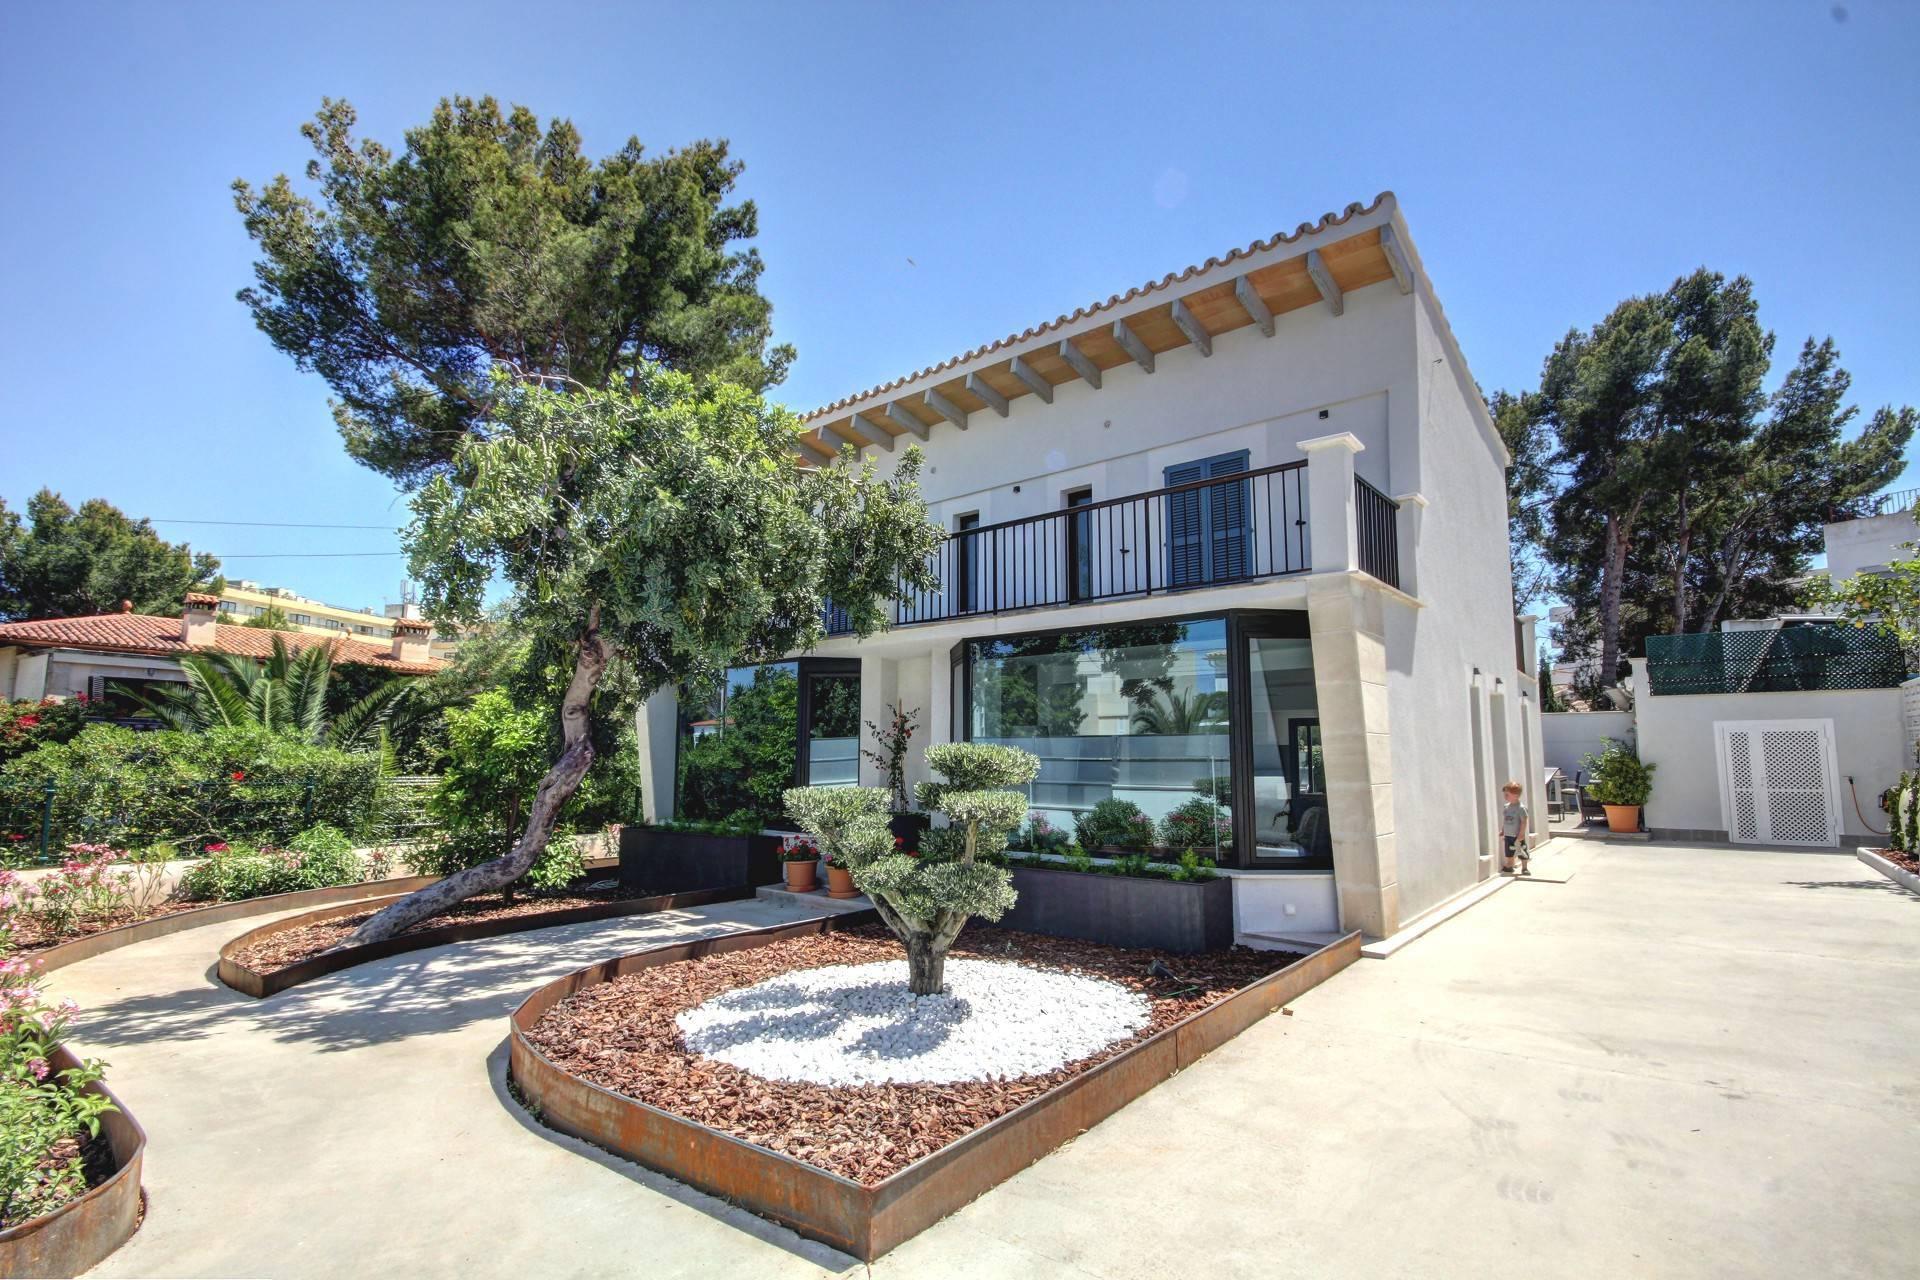 01-264 Modernes Ferienhaus Mallorca Südwesten Bild 1